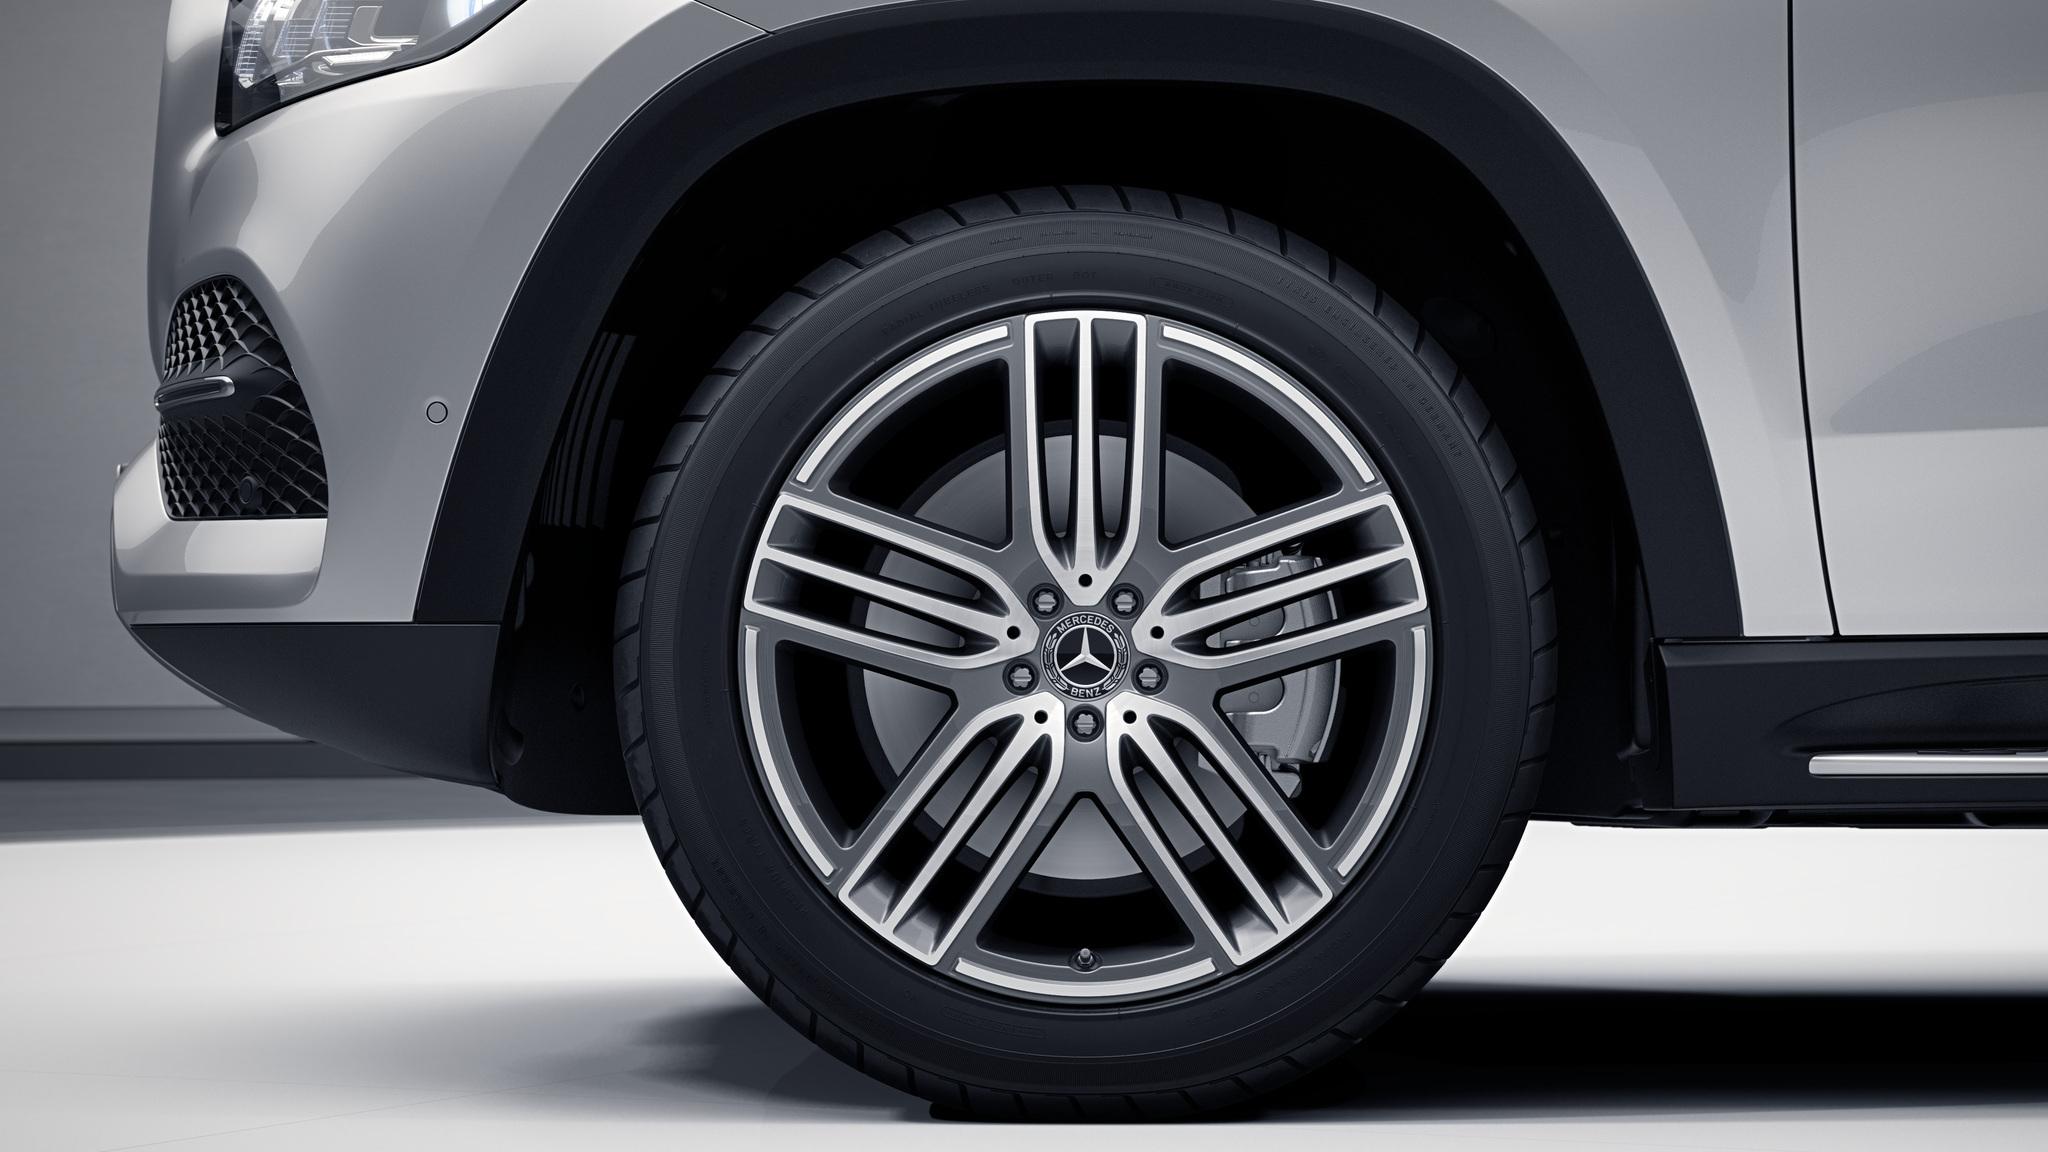 "Jantes 21"" à 5 triples branches de la Mercedes-Benz GLS"